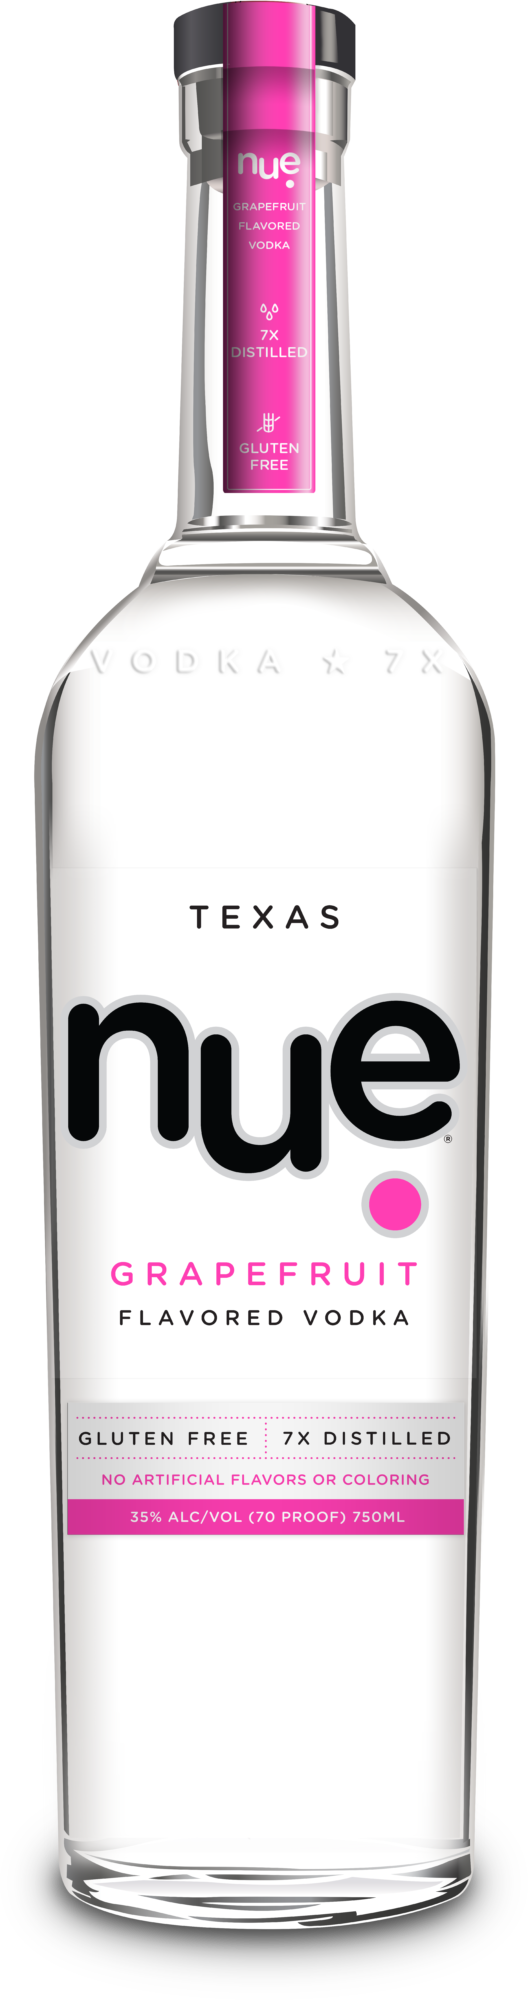 Bottle of nue grapefruit vodka